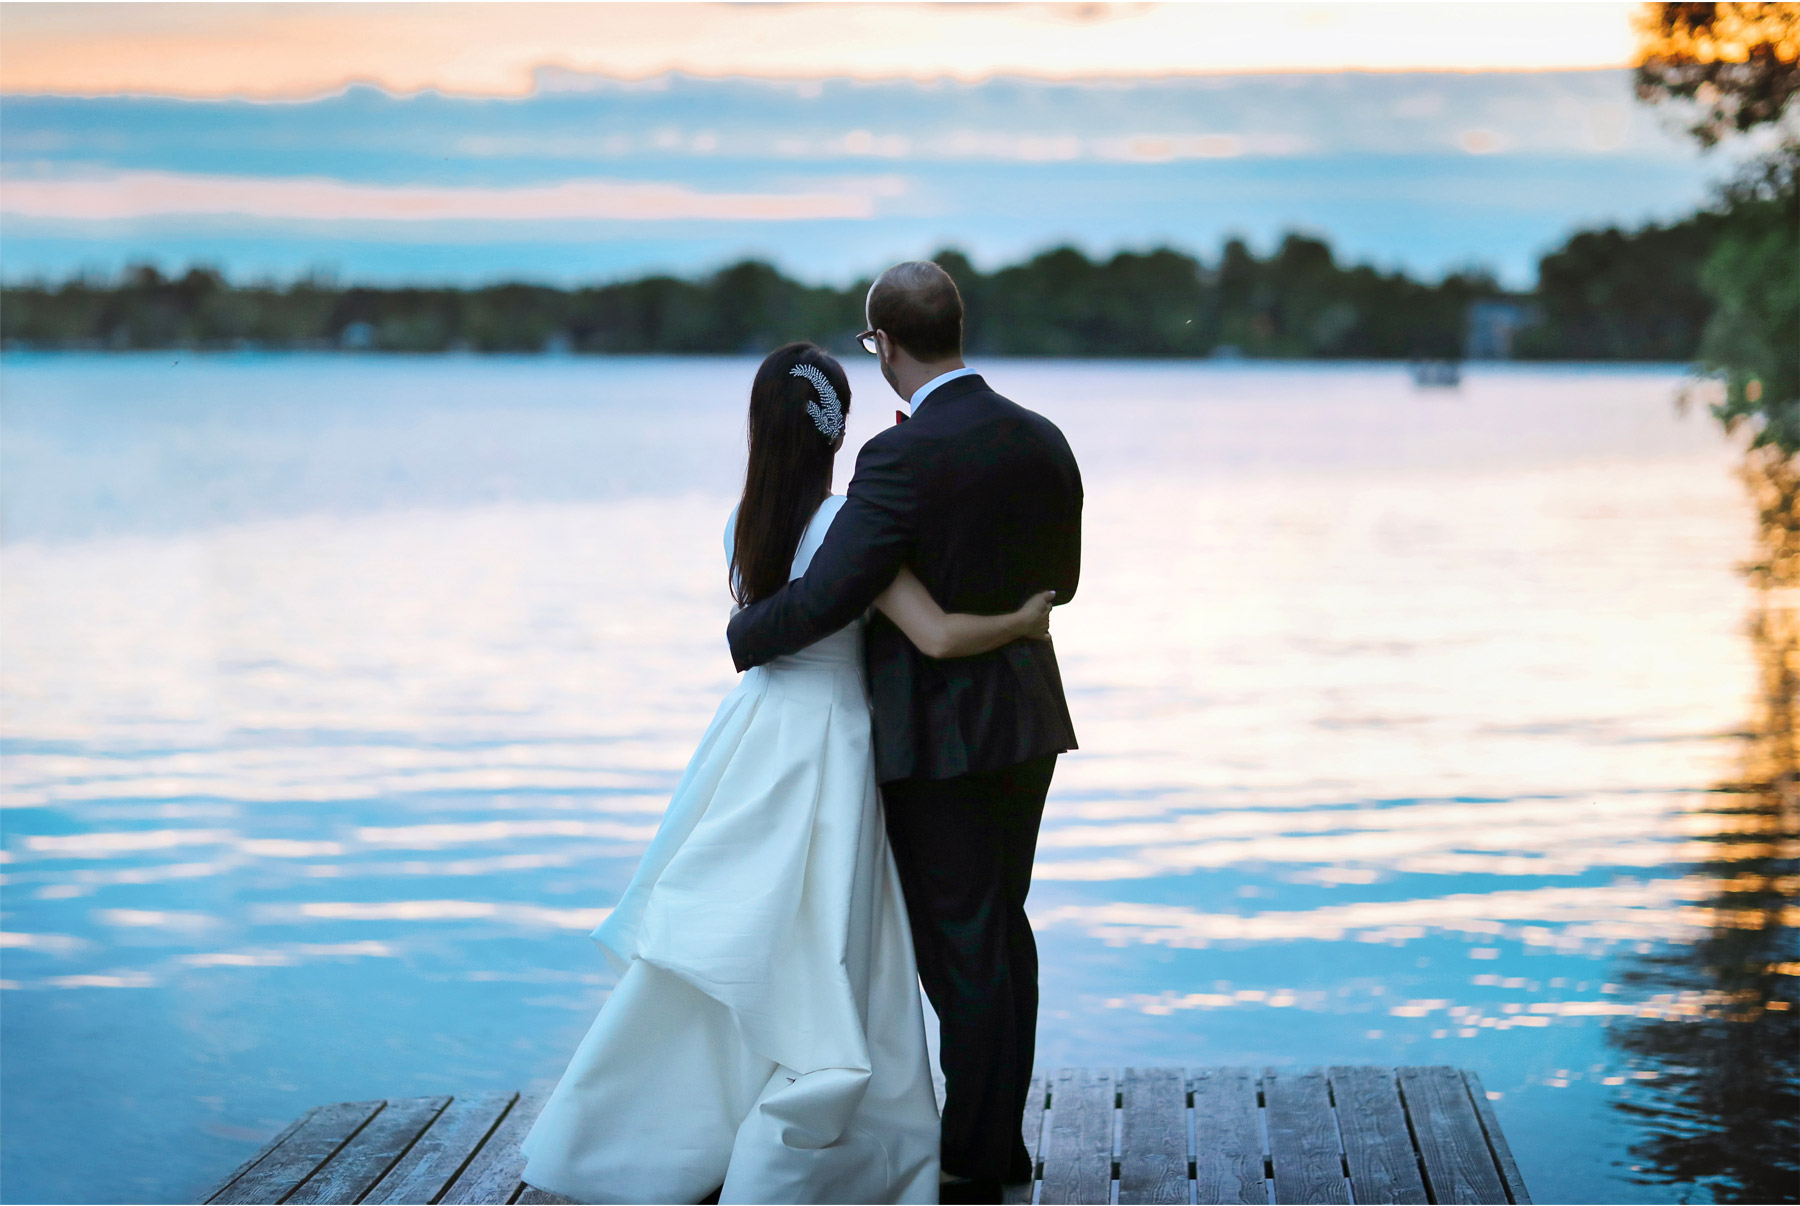 23-Vick-Photography-Wedding-Stouts-Island-Lodge-Wisconsin-Summer-Lake-Sunset-Dock-MiJa-and-Lucius.jpg